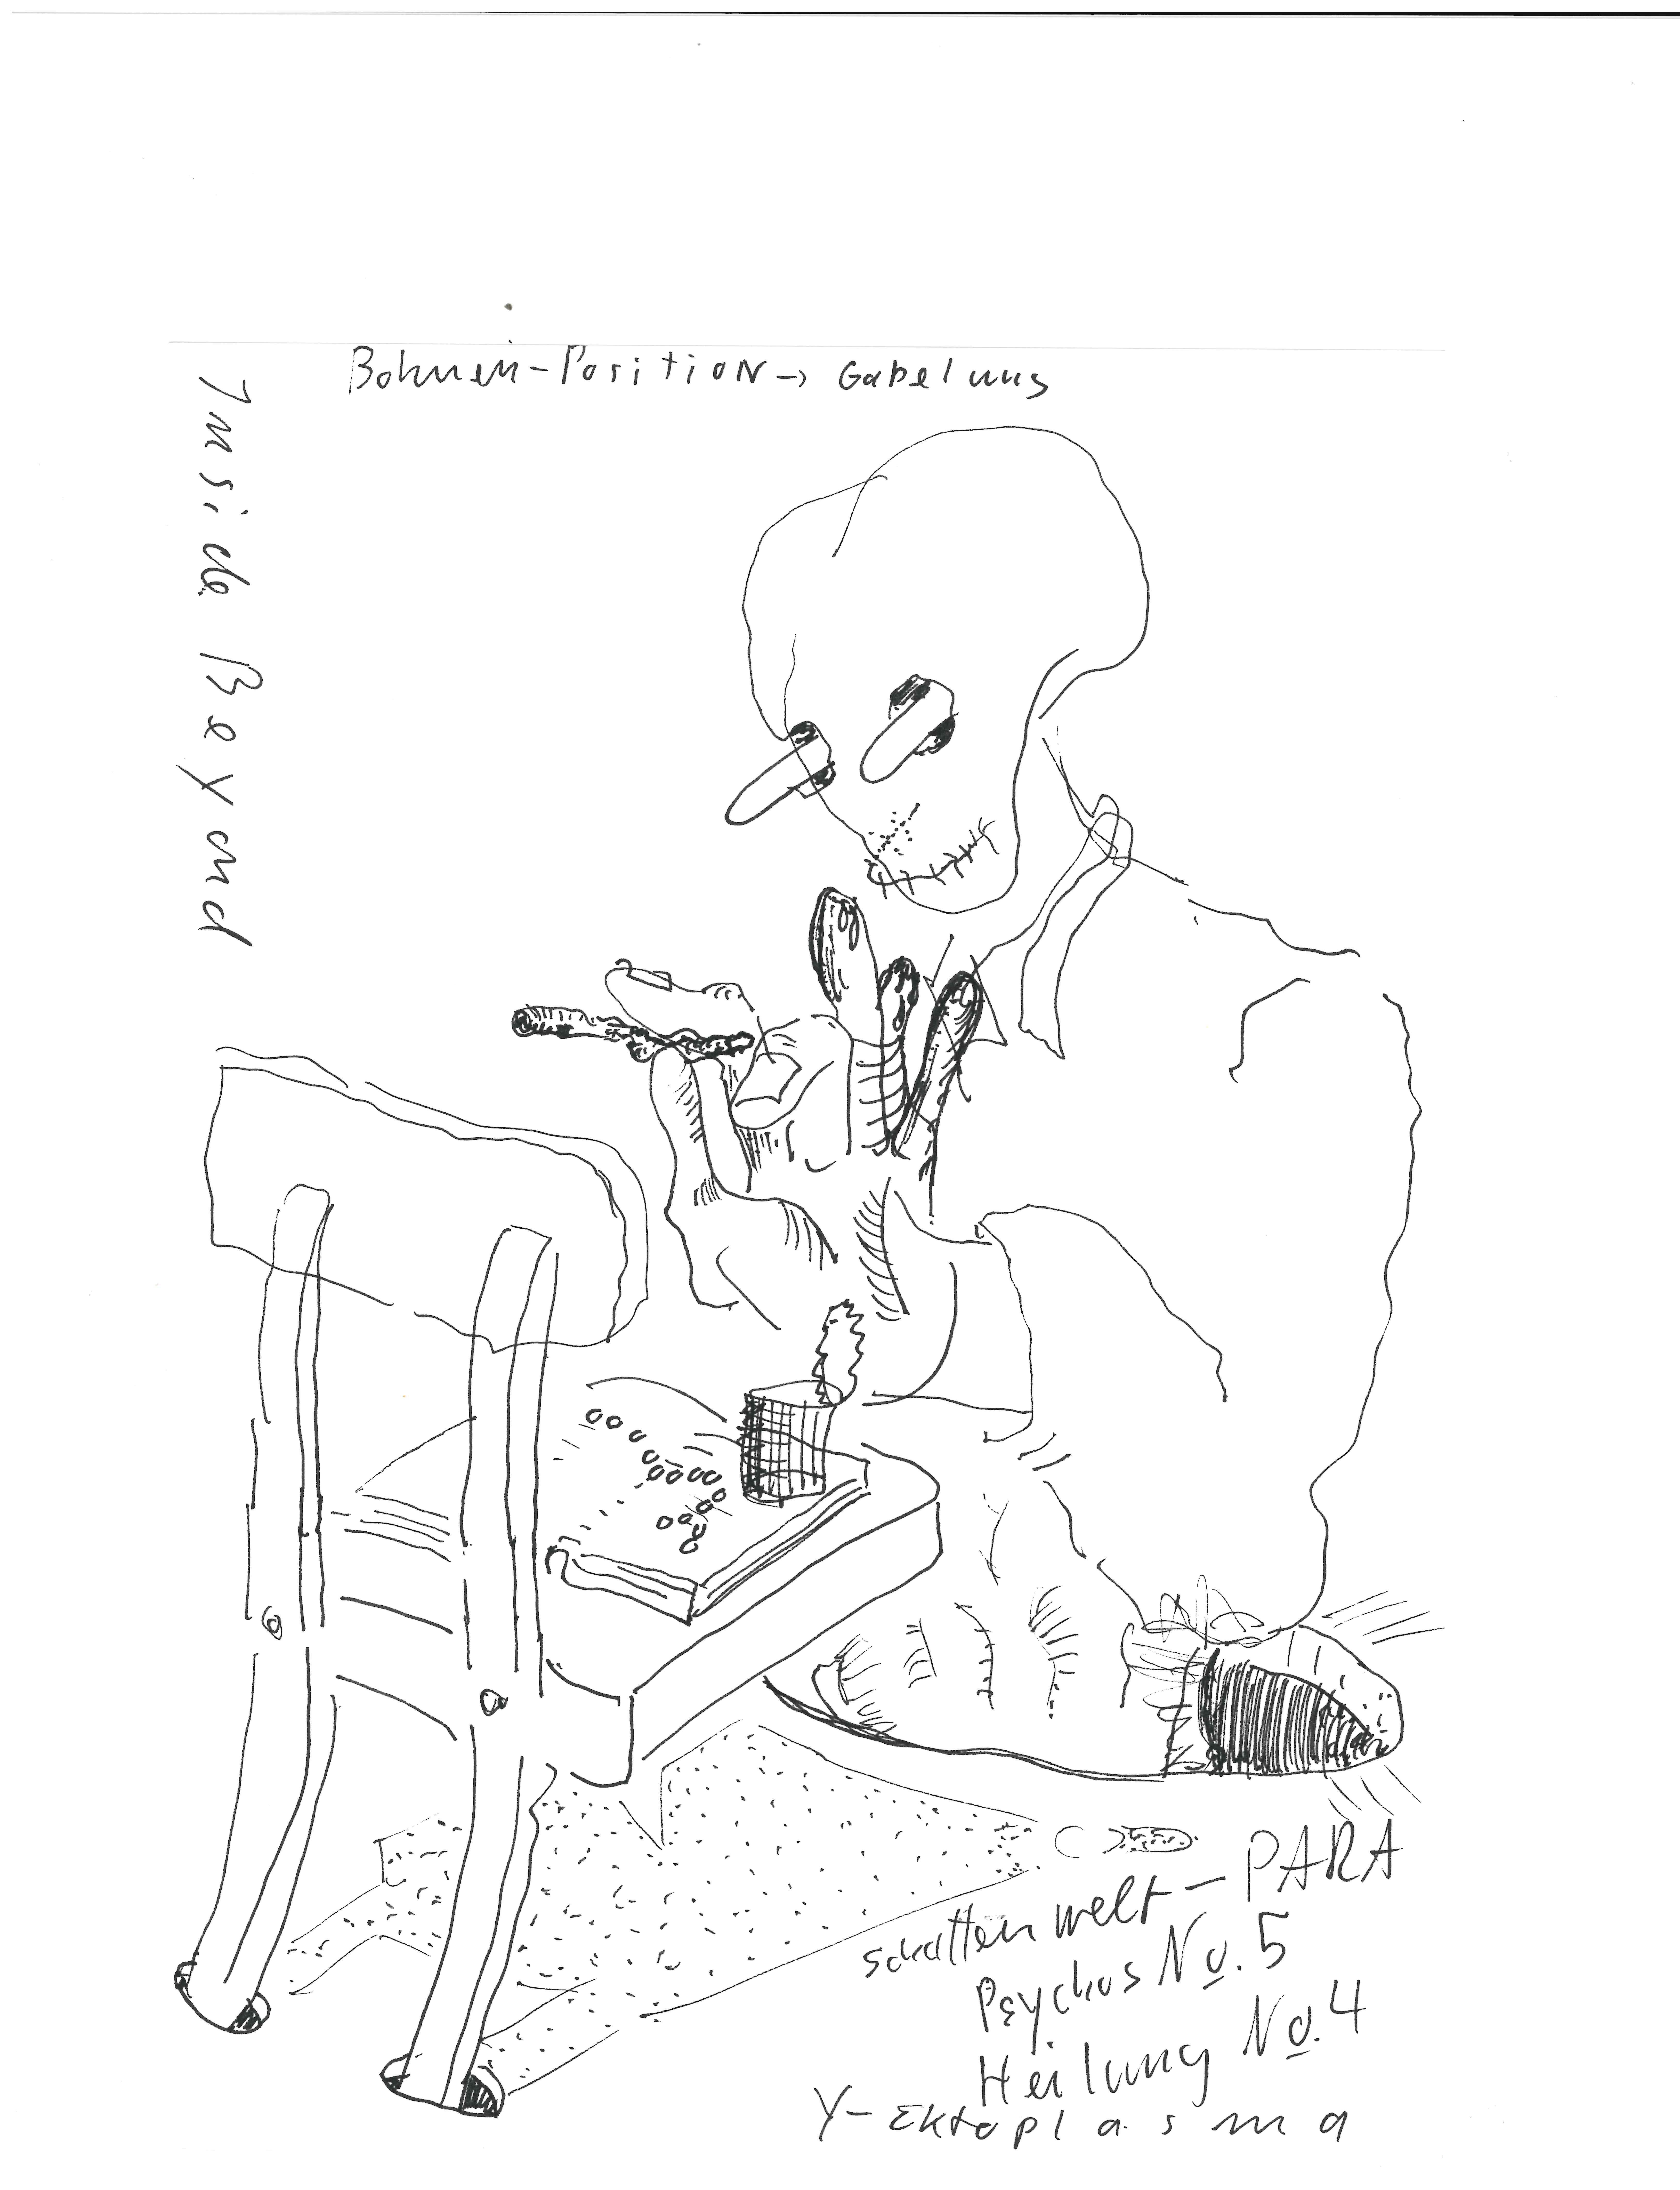 John Bock Inside Beyond Fineliner auf Papier, 2019 JB/D 1906